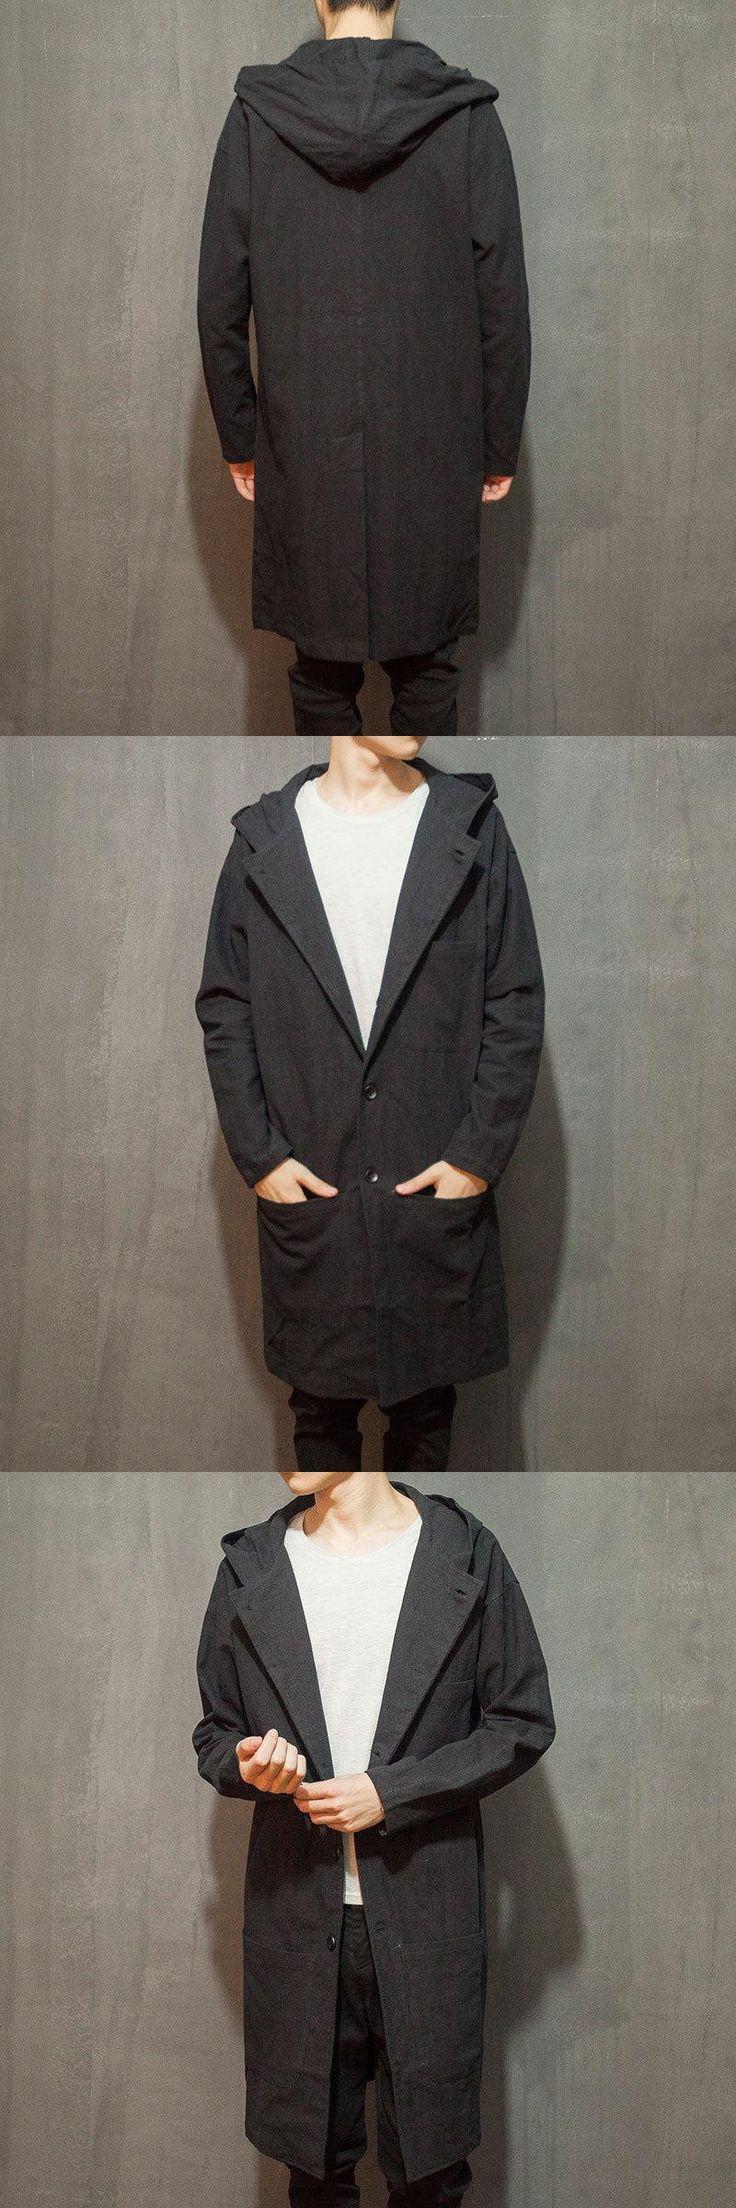 2017 Mens Overcoat Trench Coat The Original Design Of Autumn Coat Male Cardigan Long Chinese Youth Wind Line Cloak Of Hanfu